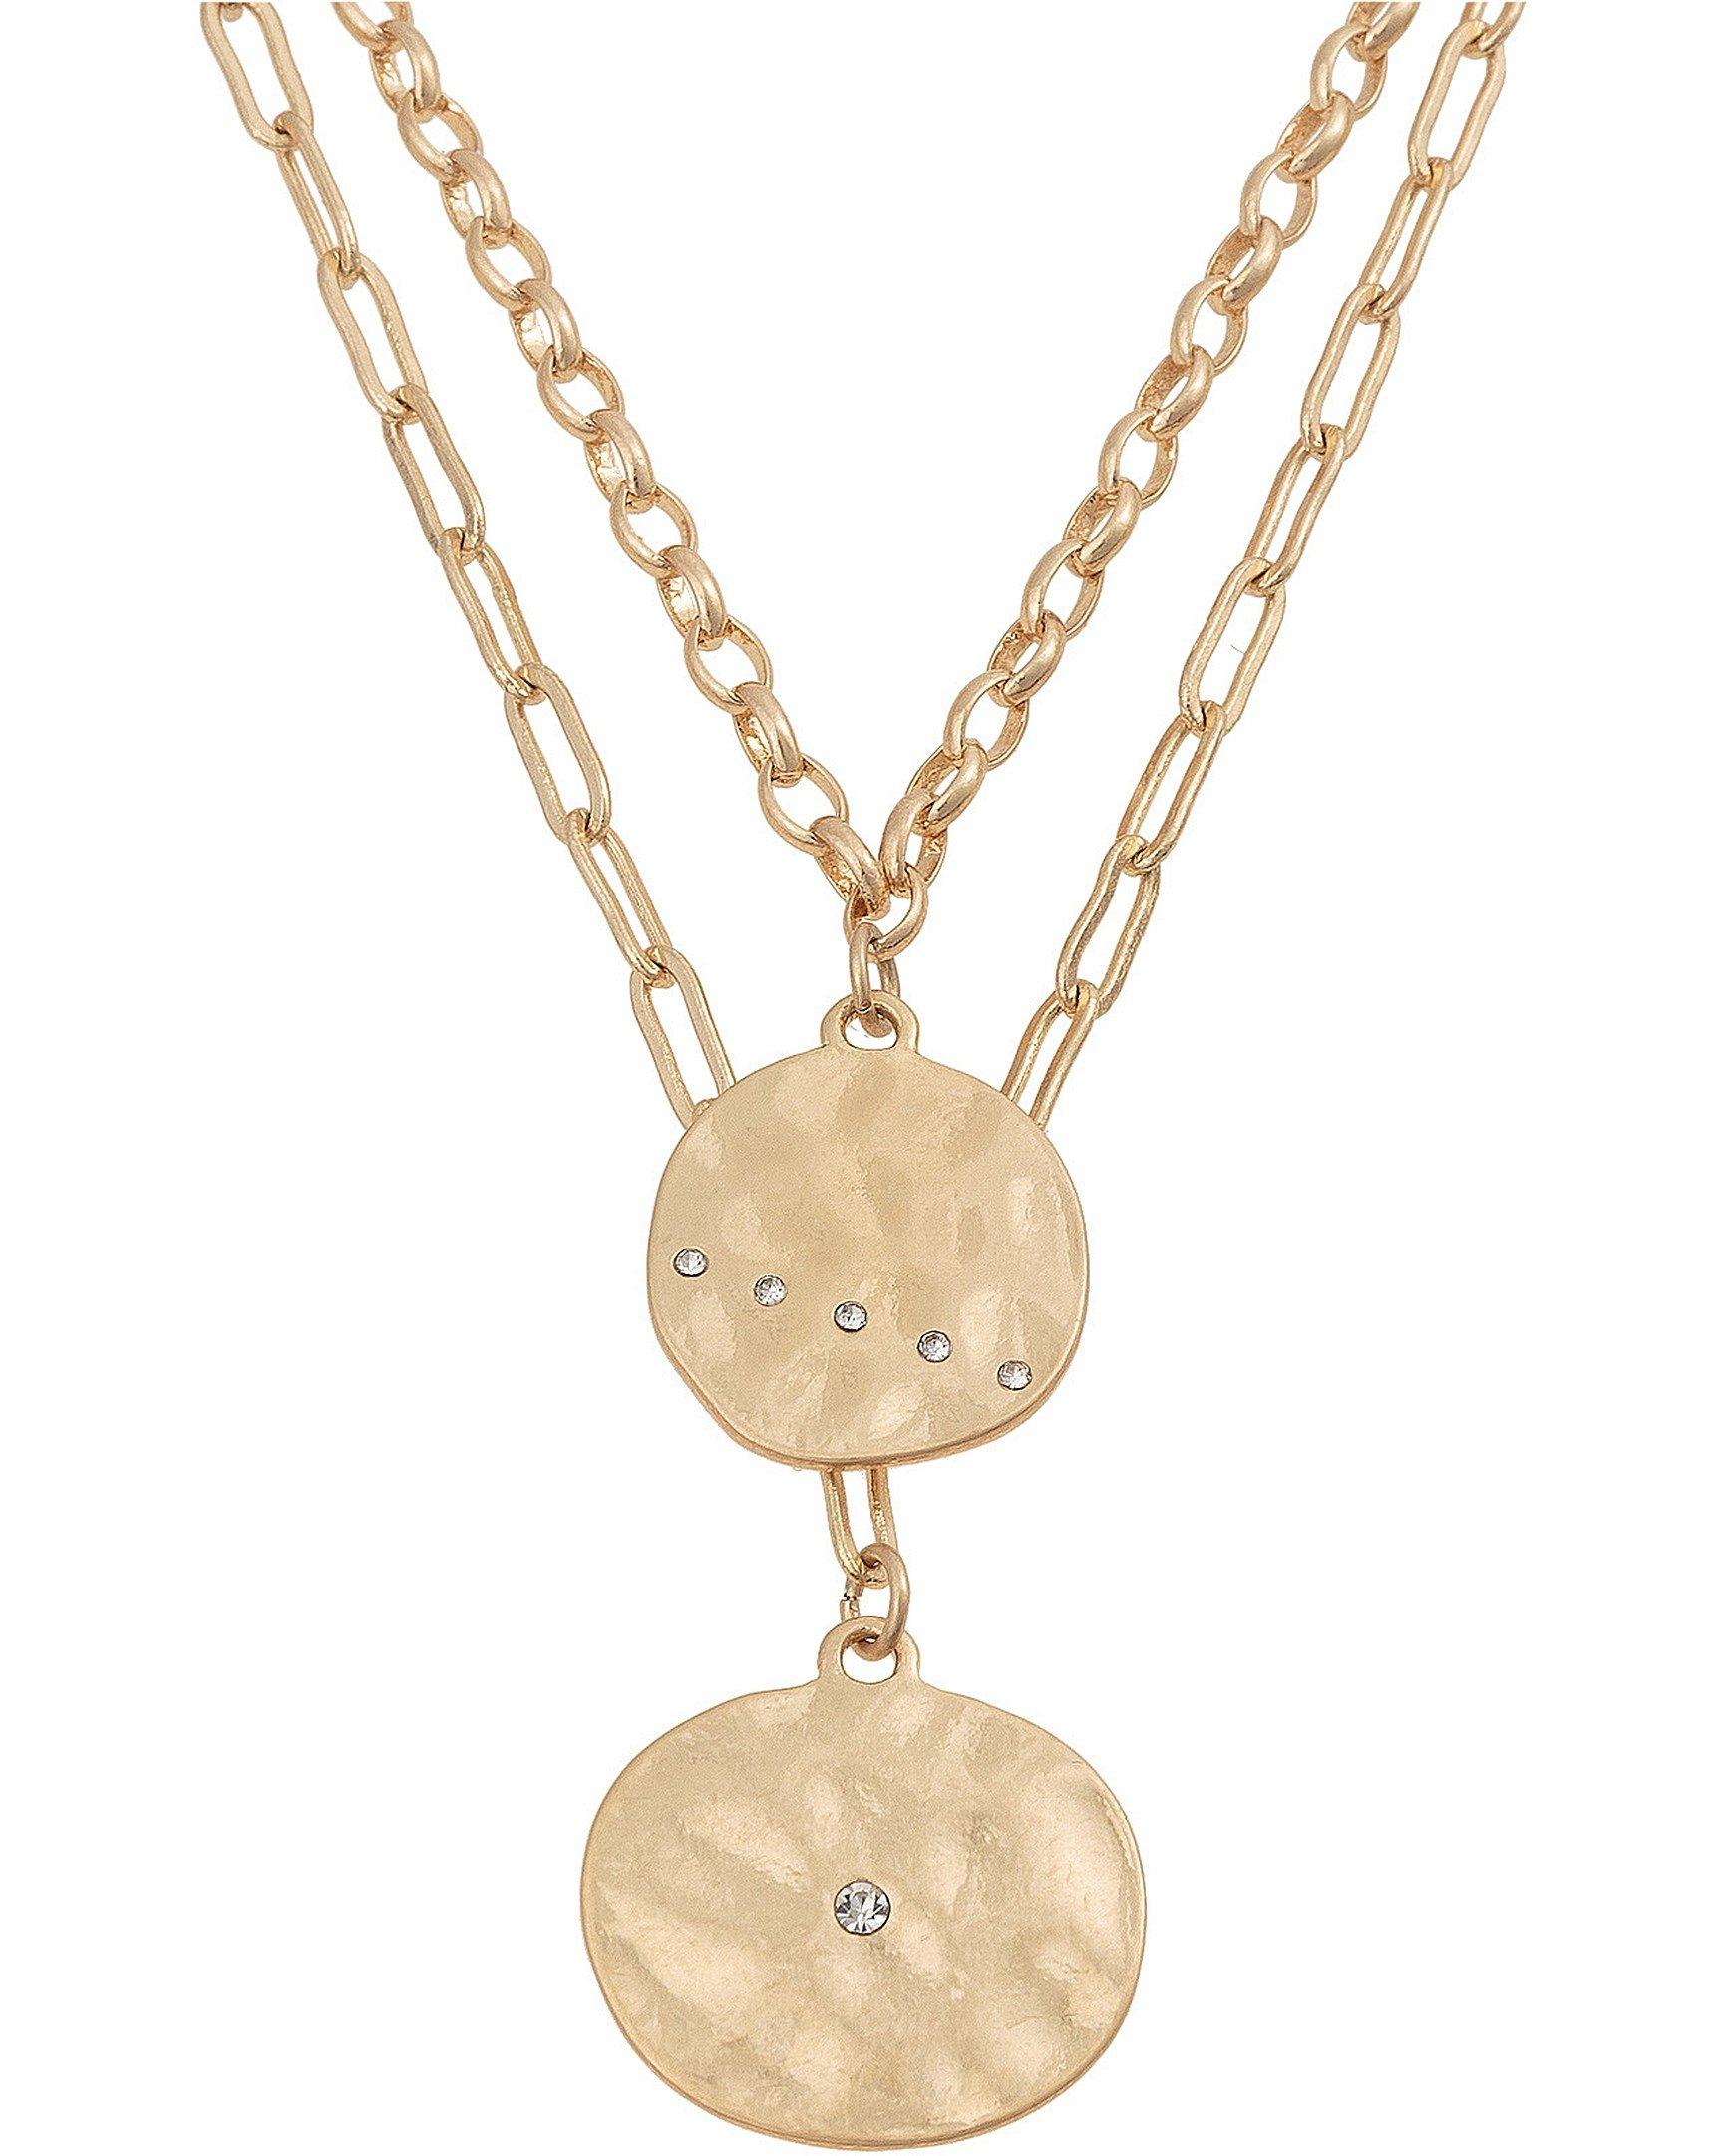 1fa16bd03 Necklaces & Pendant Necklaces for Women | Oliver Bonas